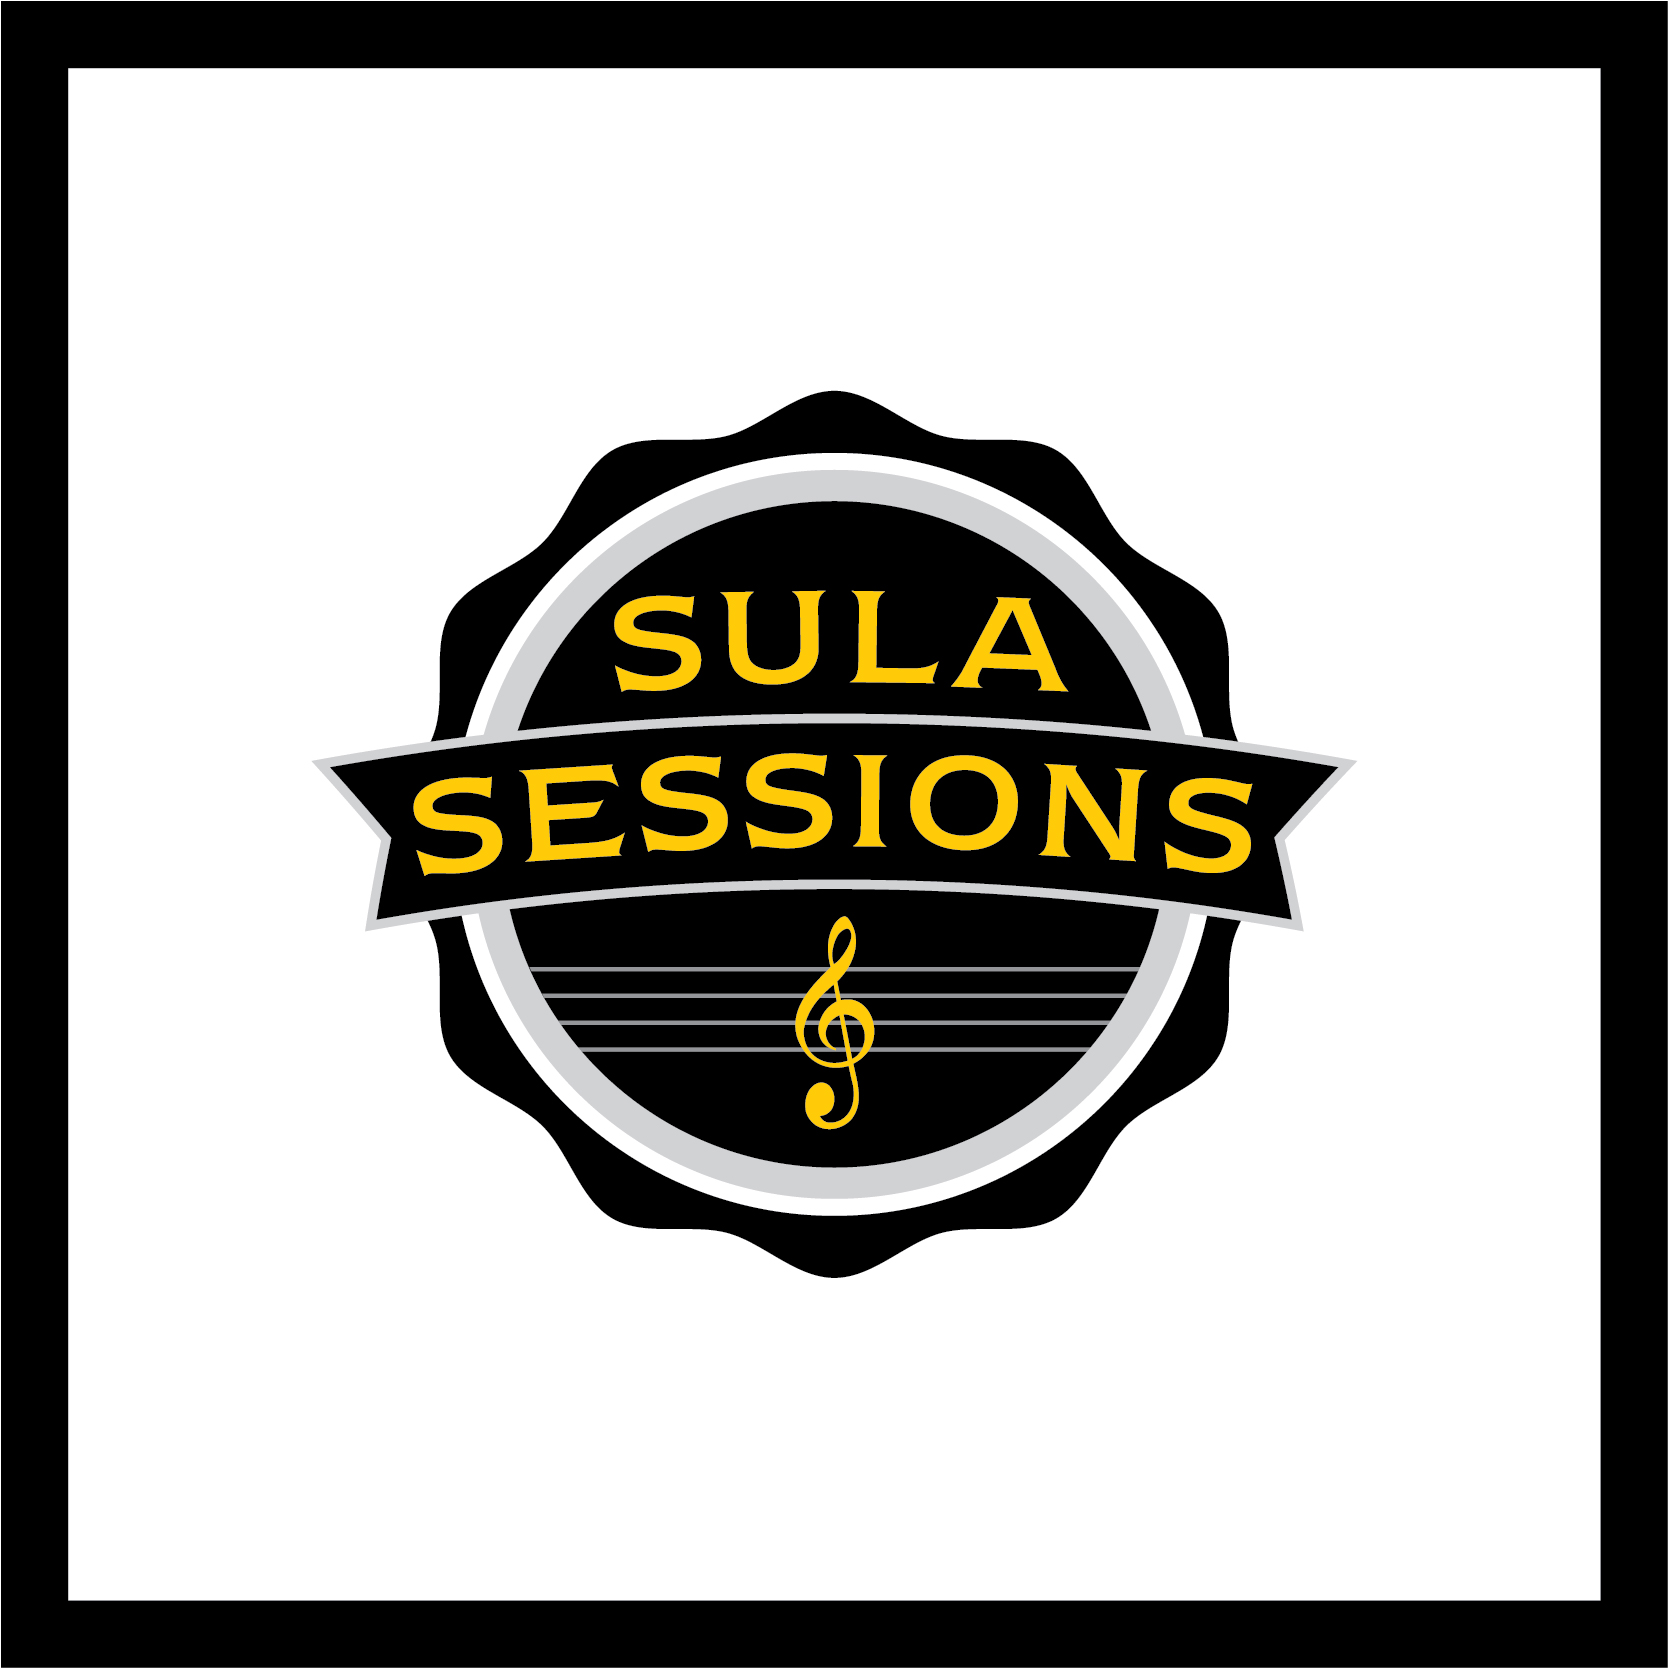 SULA-SESSIONS